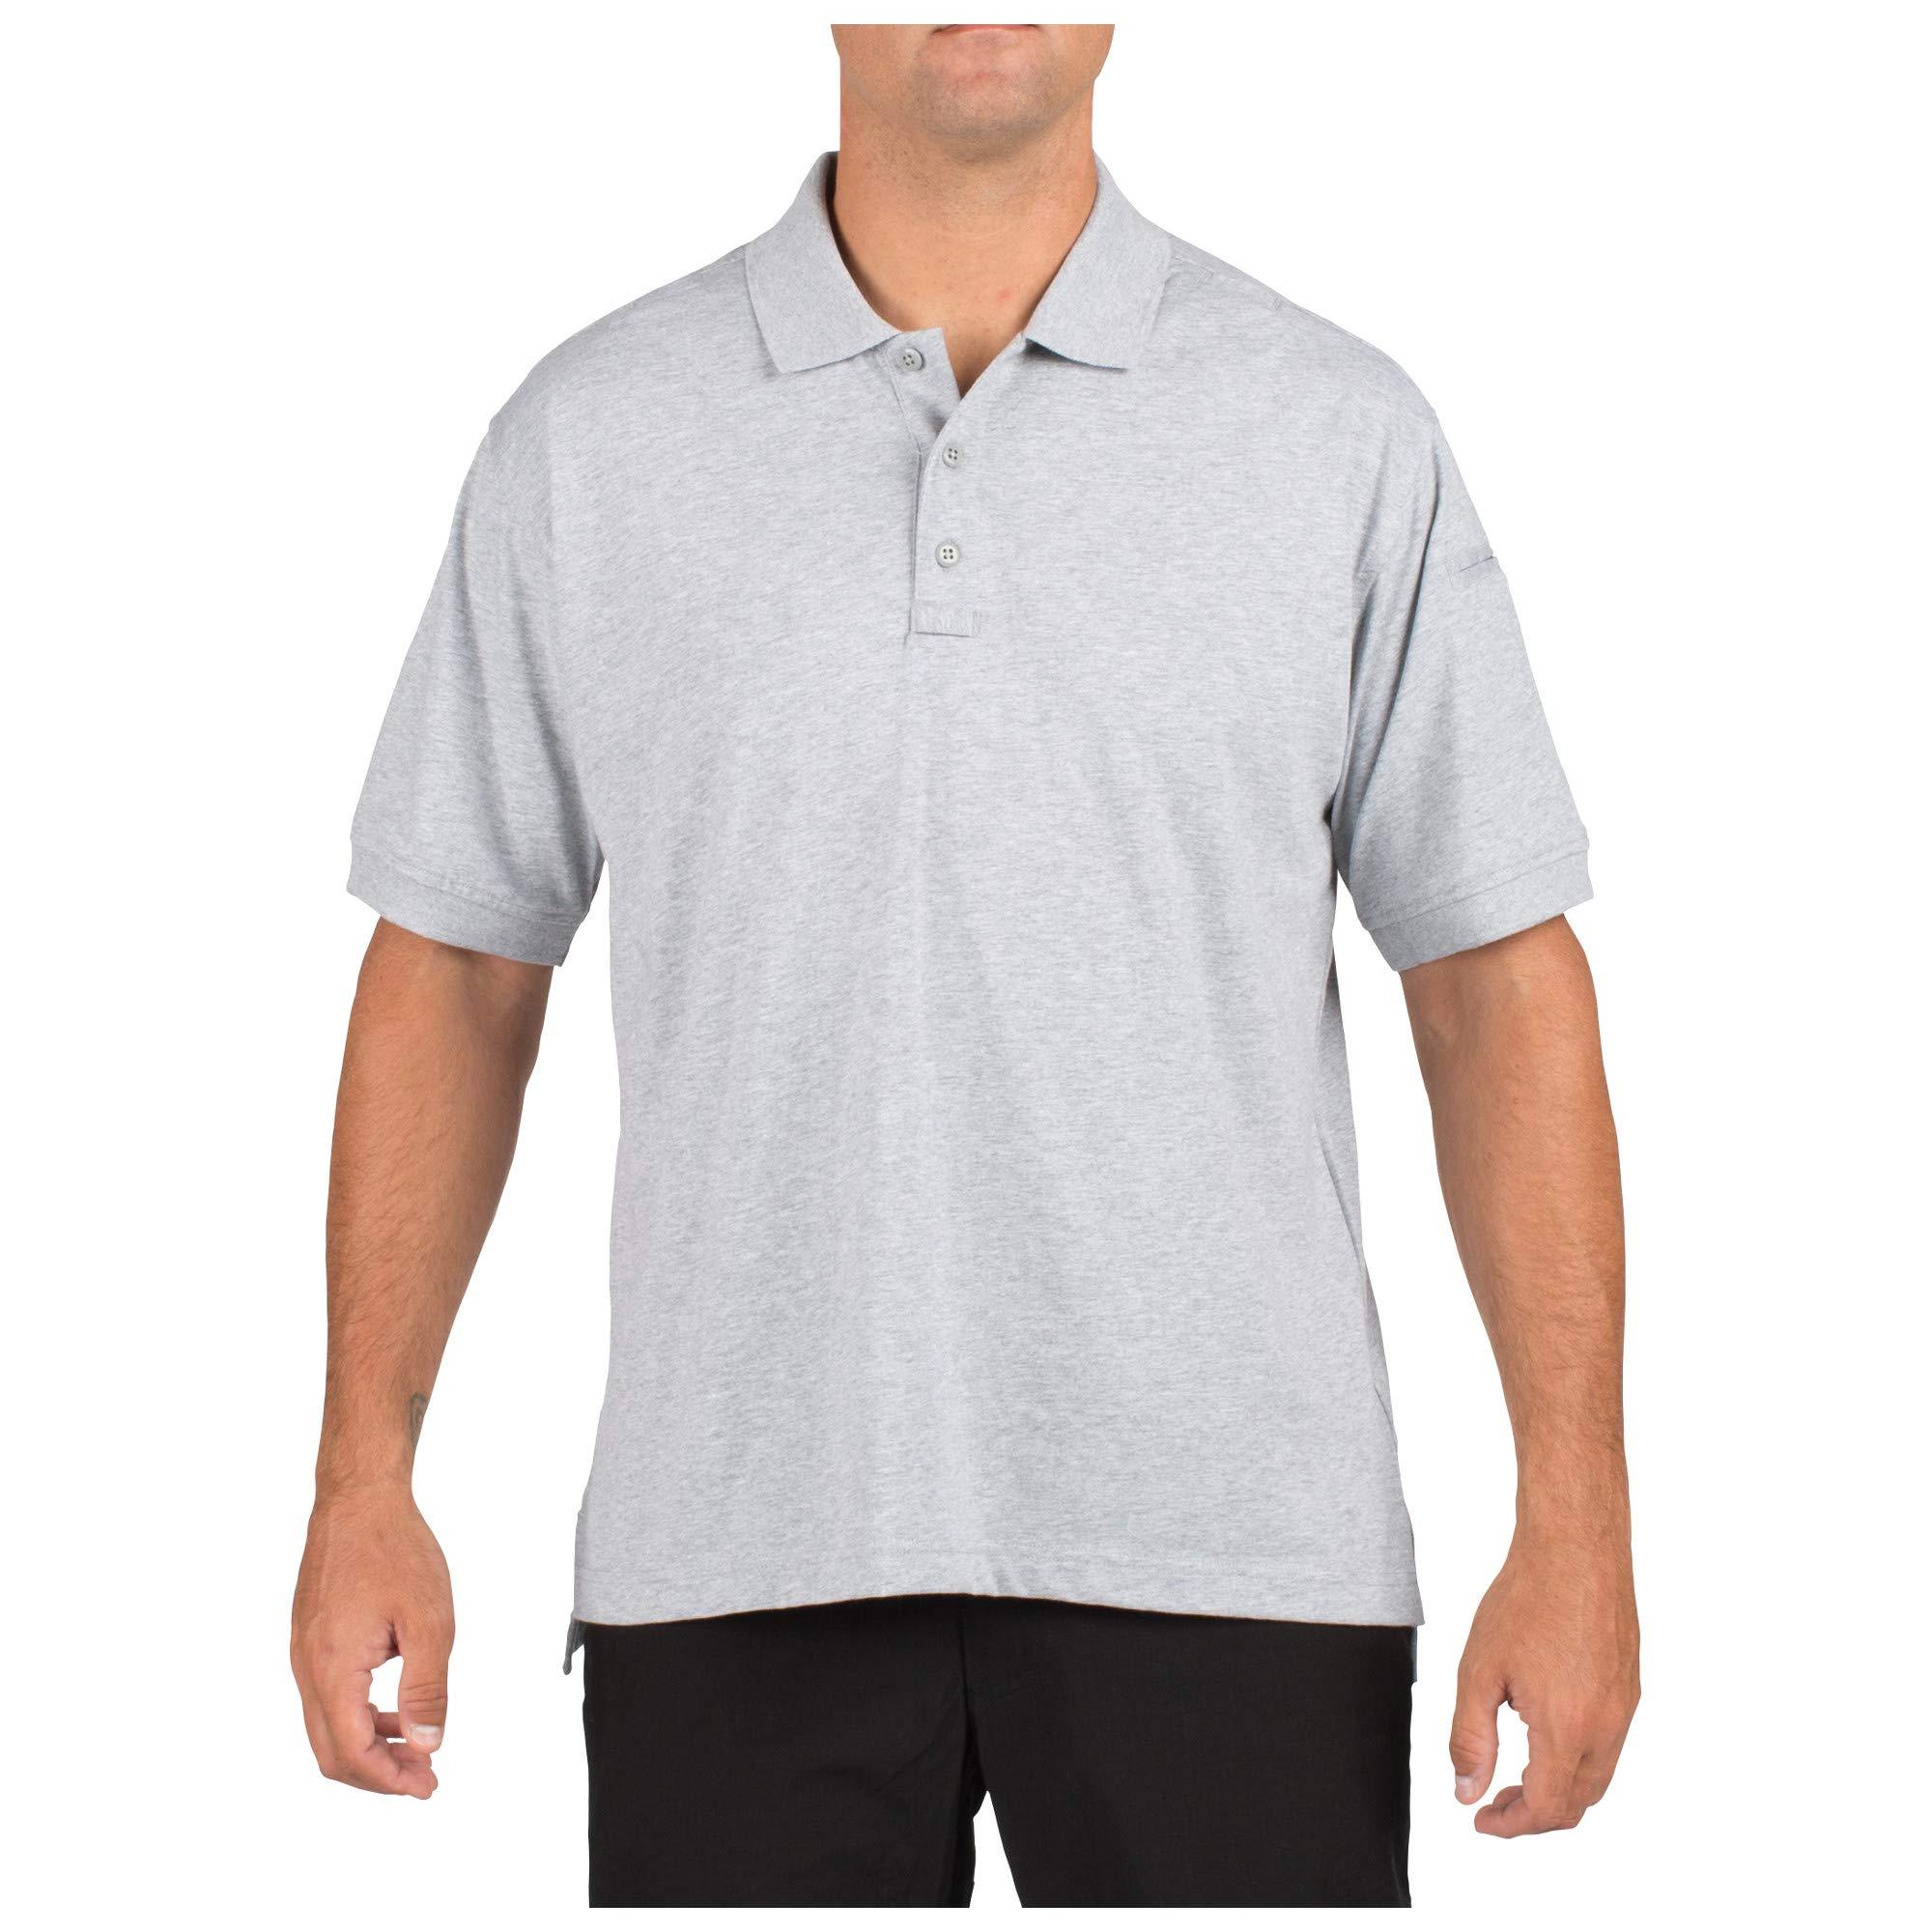 5.11 Tactical Tactical Short-Sleeve Polo, Heather Grey, Medium